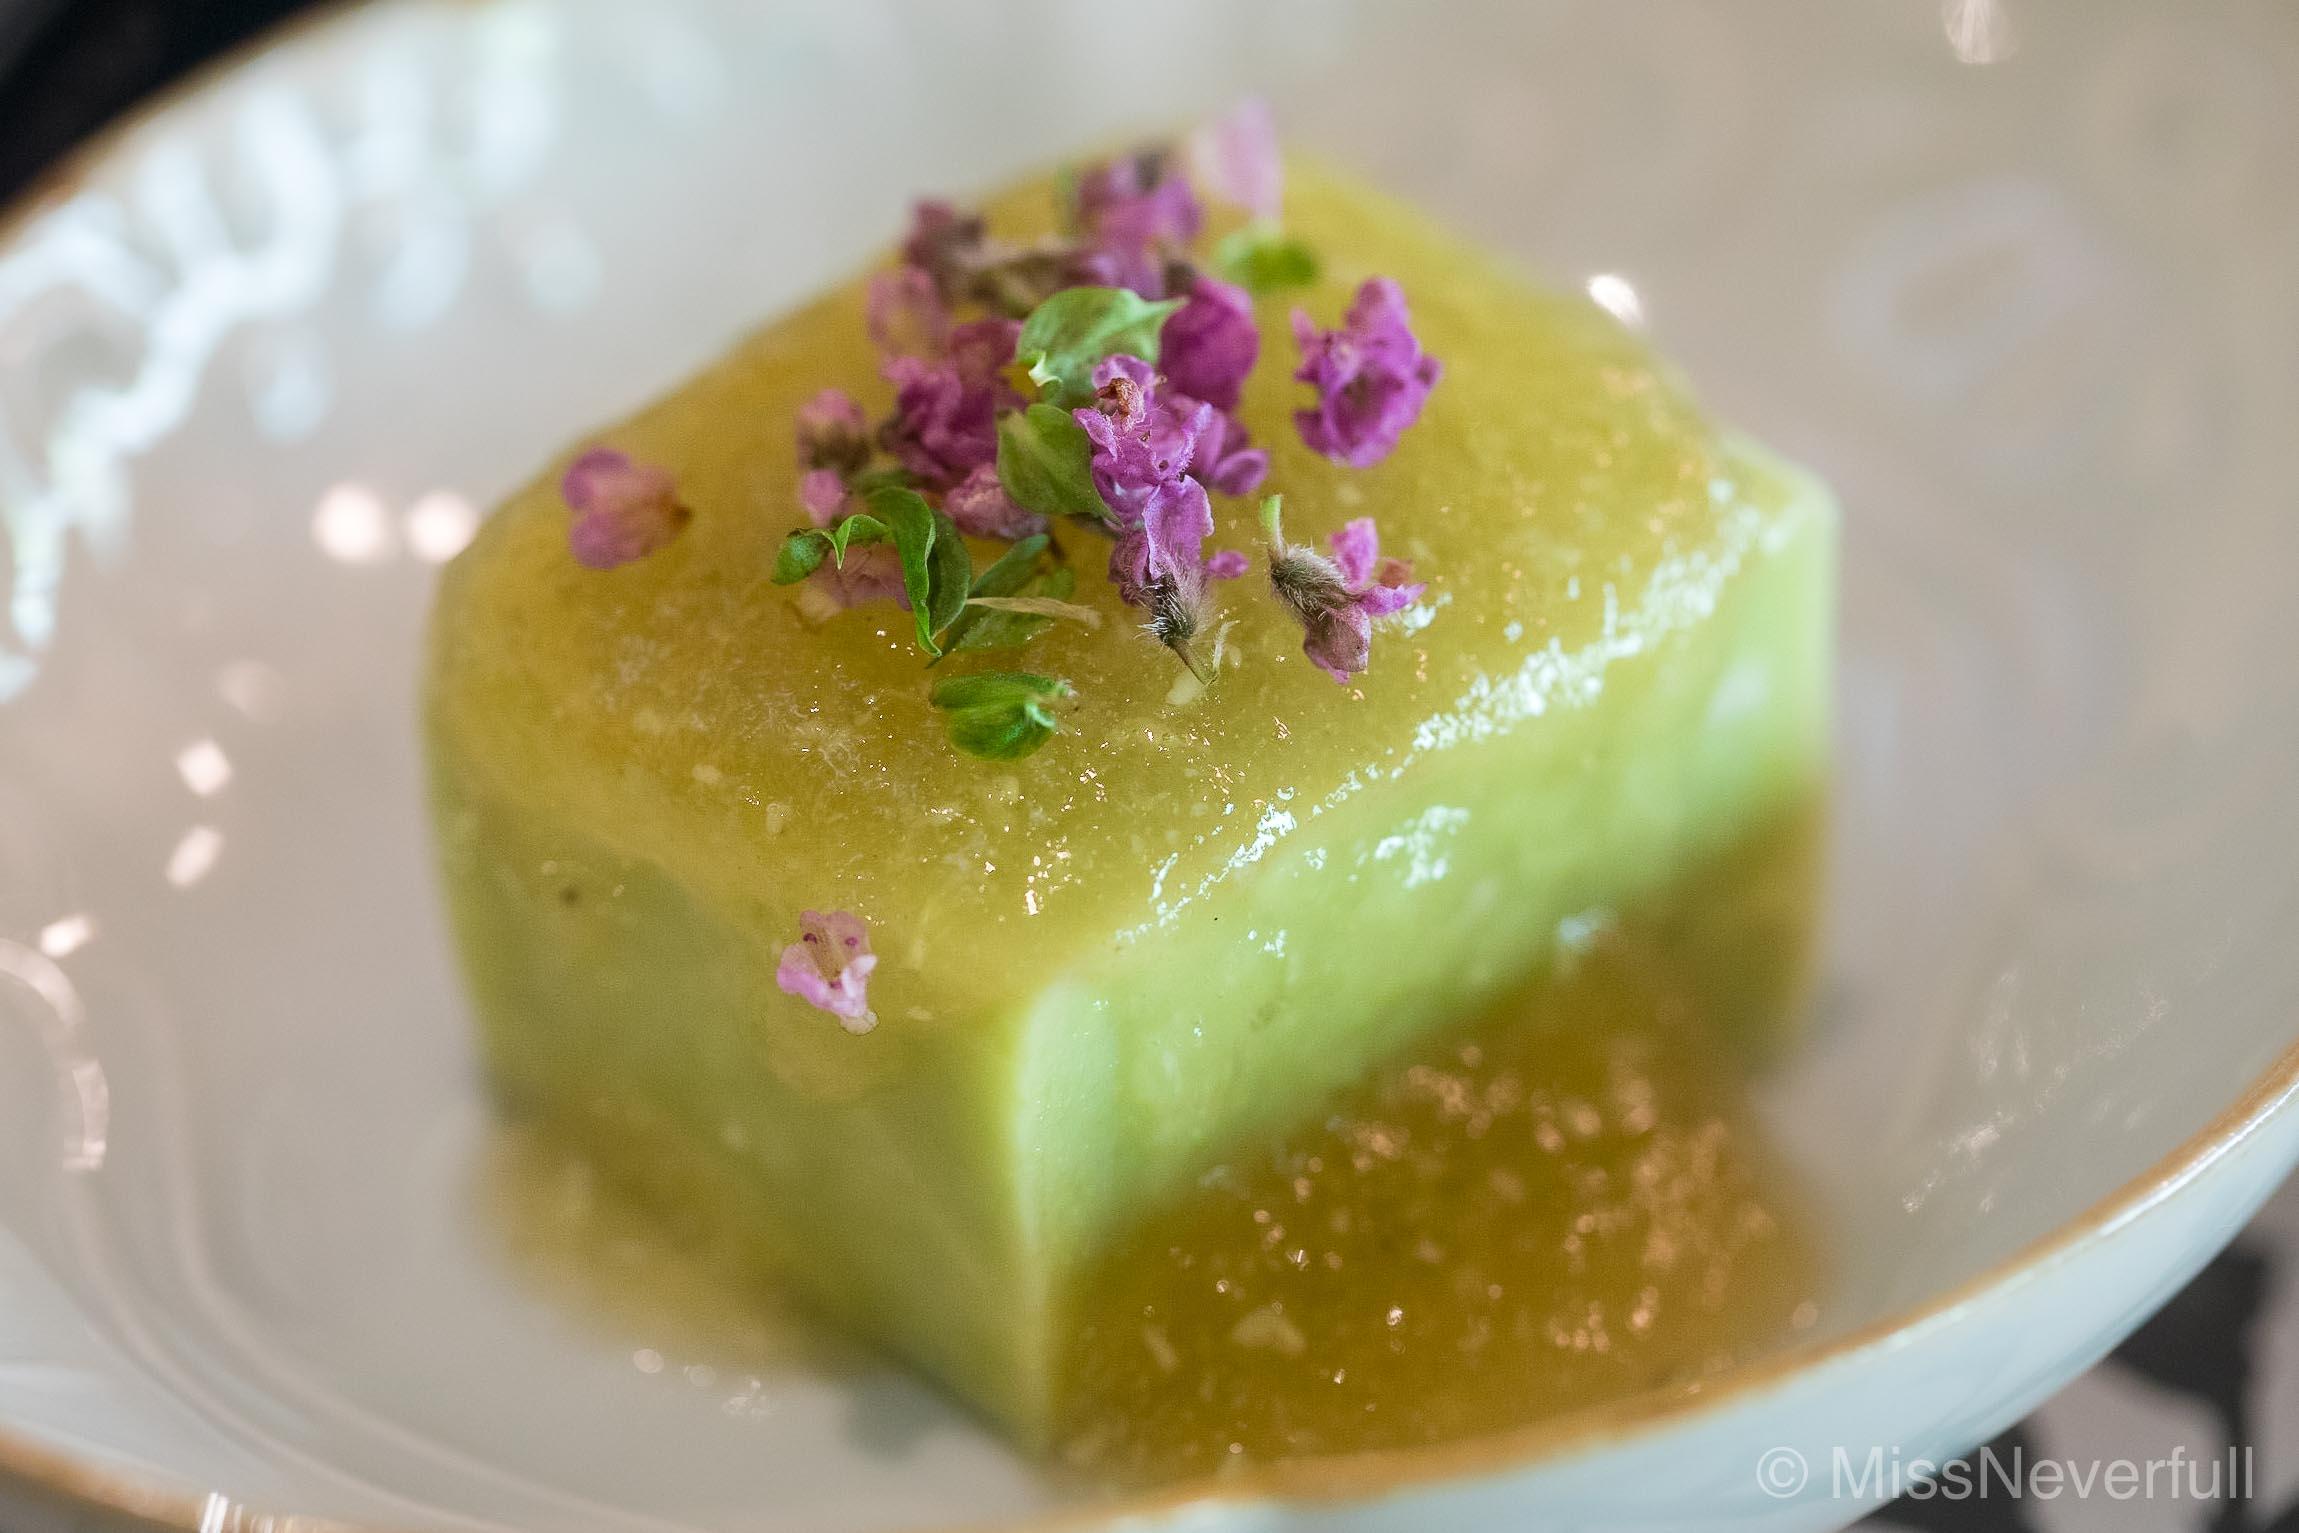 Appetizer 1: Goma-tofu